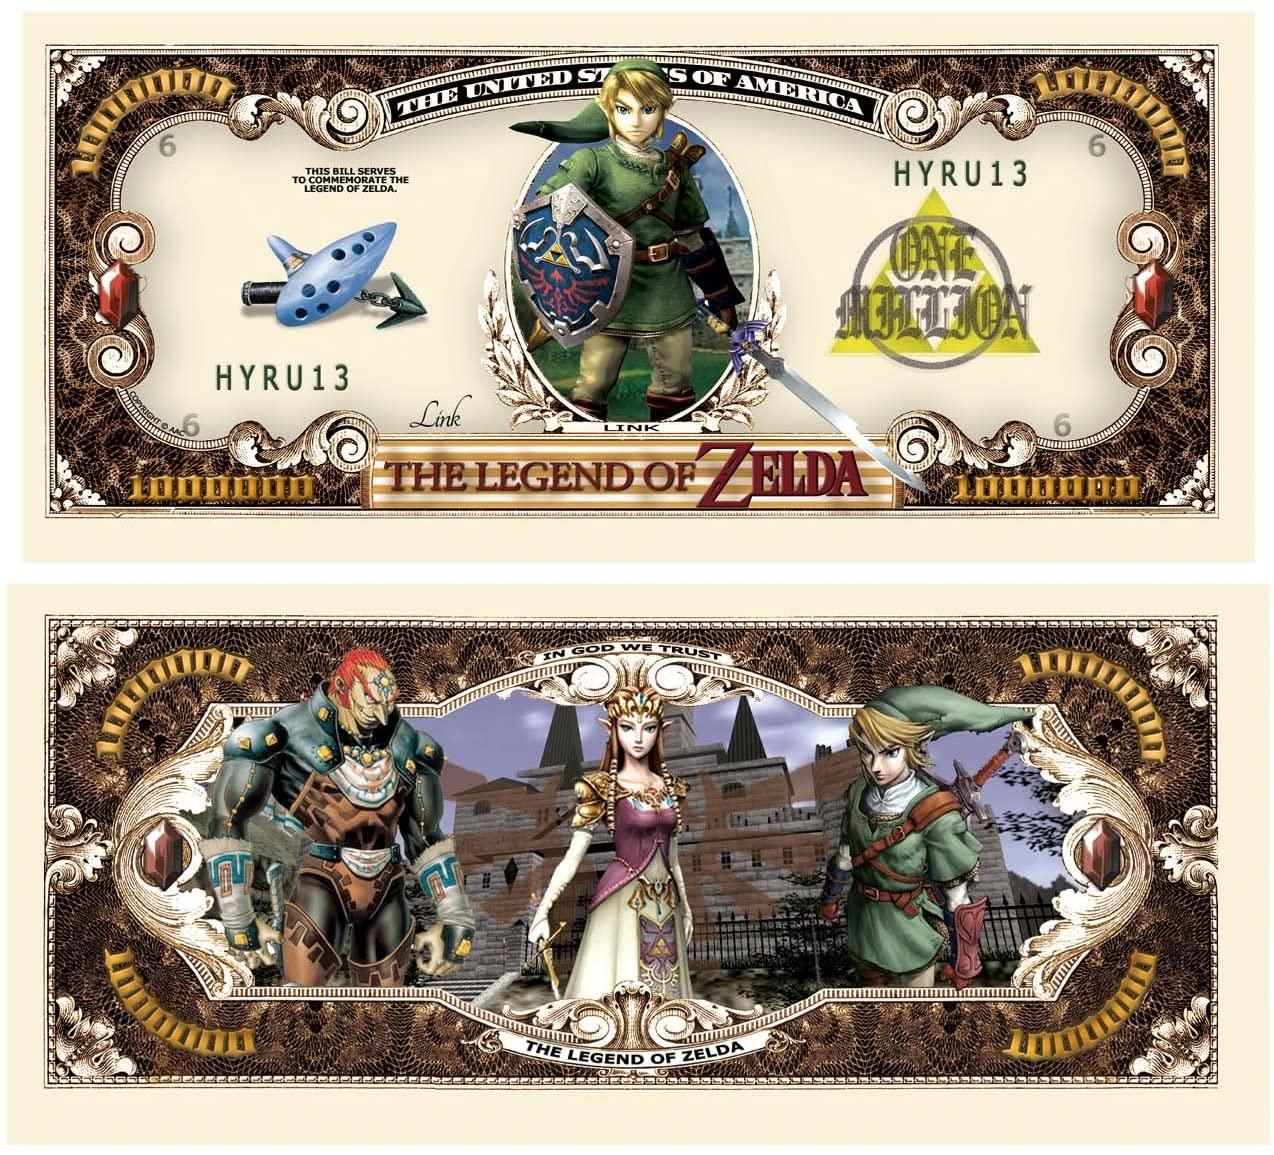 American Art Classics Pack of 100 - Legend of Zelda Limited Edition Collectible Novelty Million Dollar Bill - Best Gift for Zelda Fans Link, Twilight Princess, Ocarina